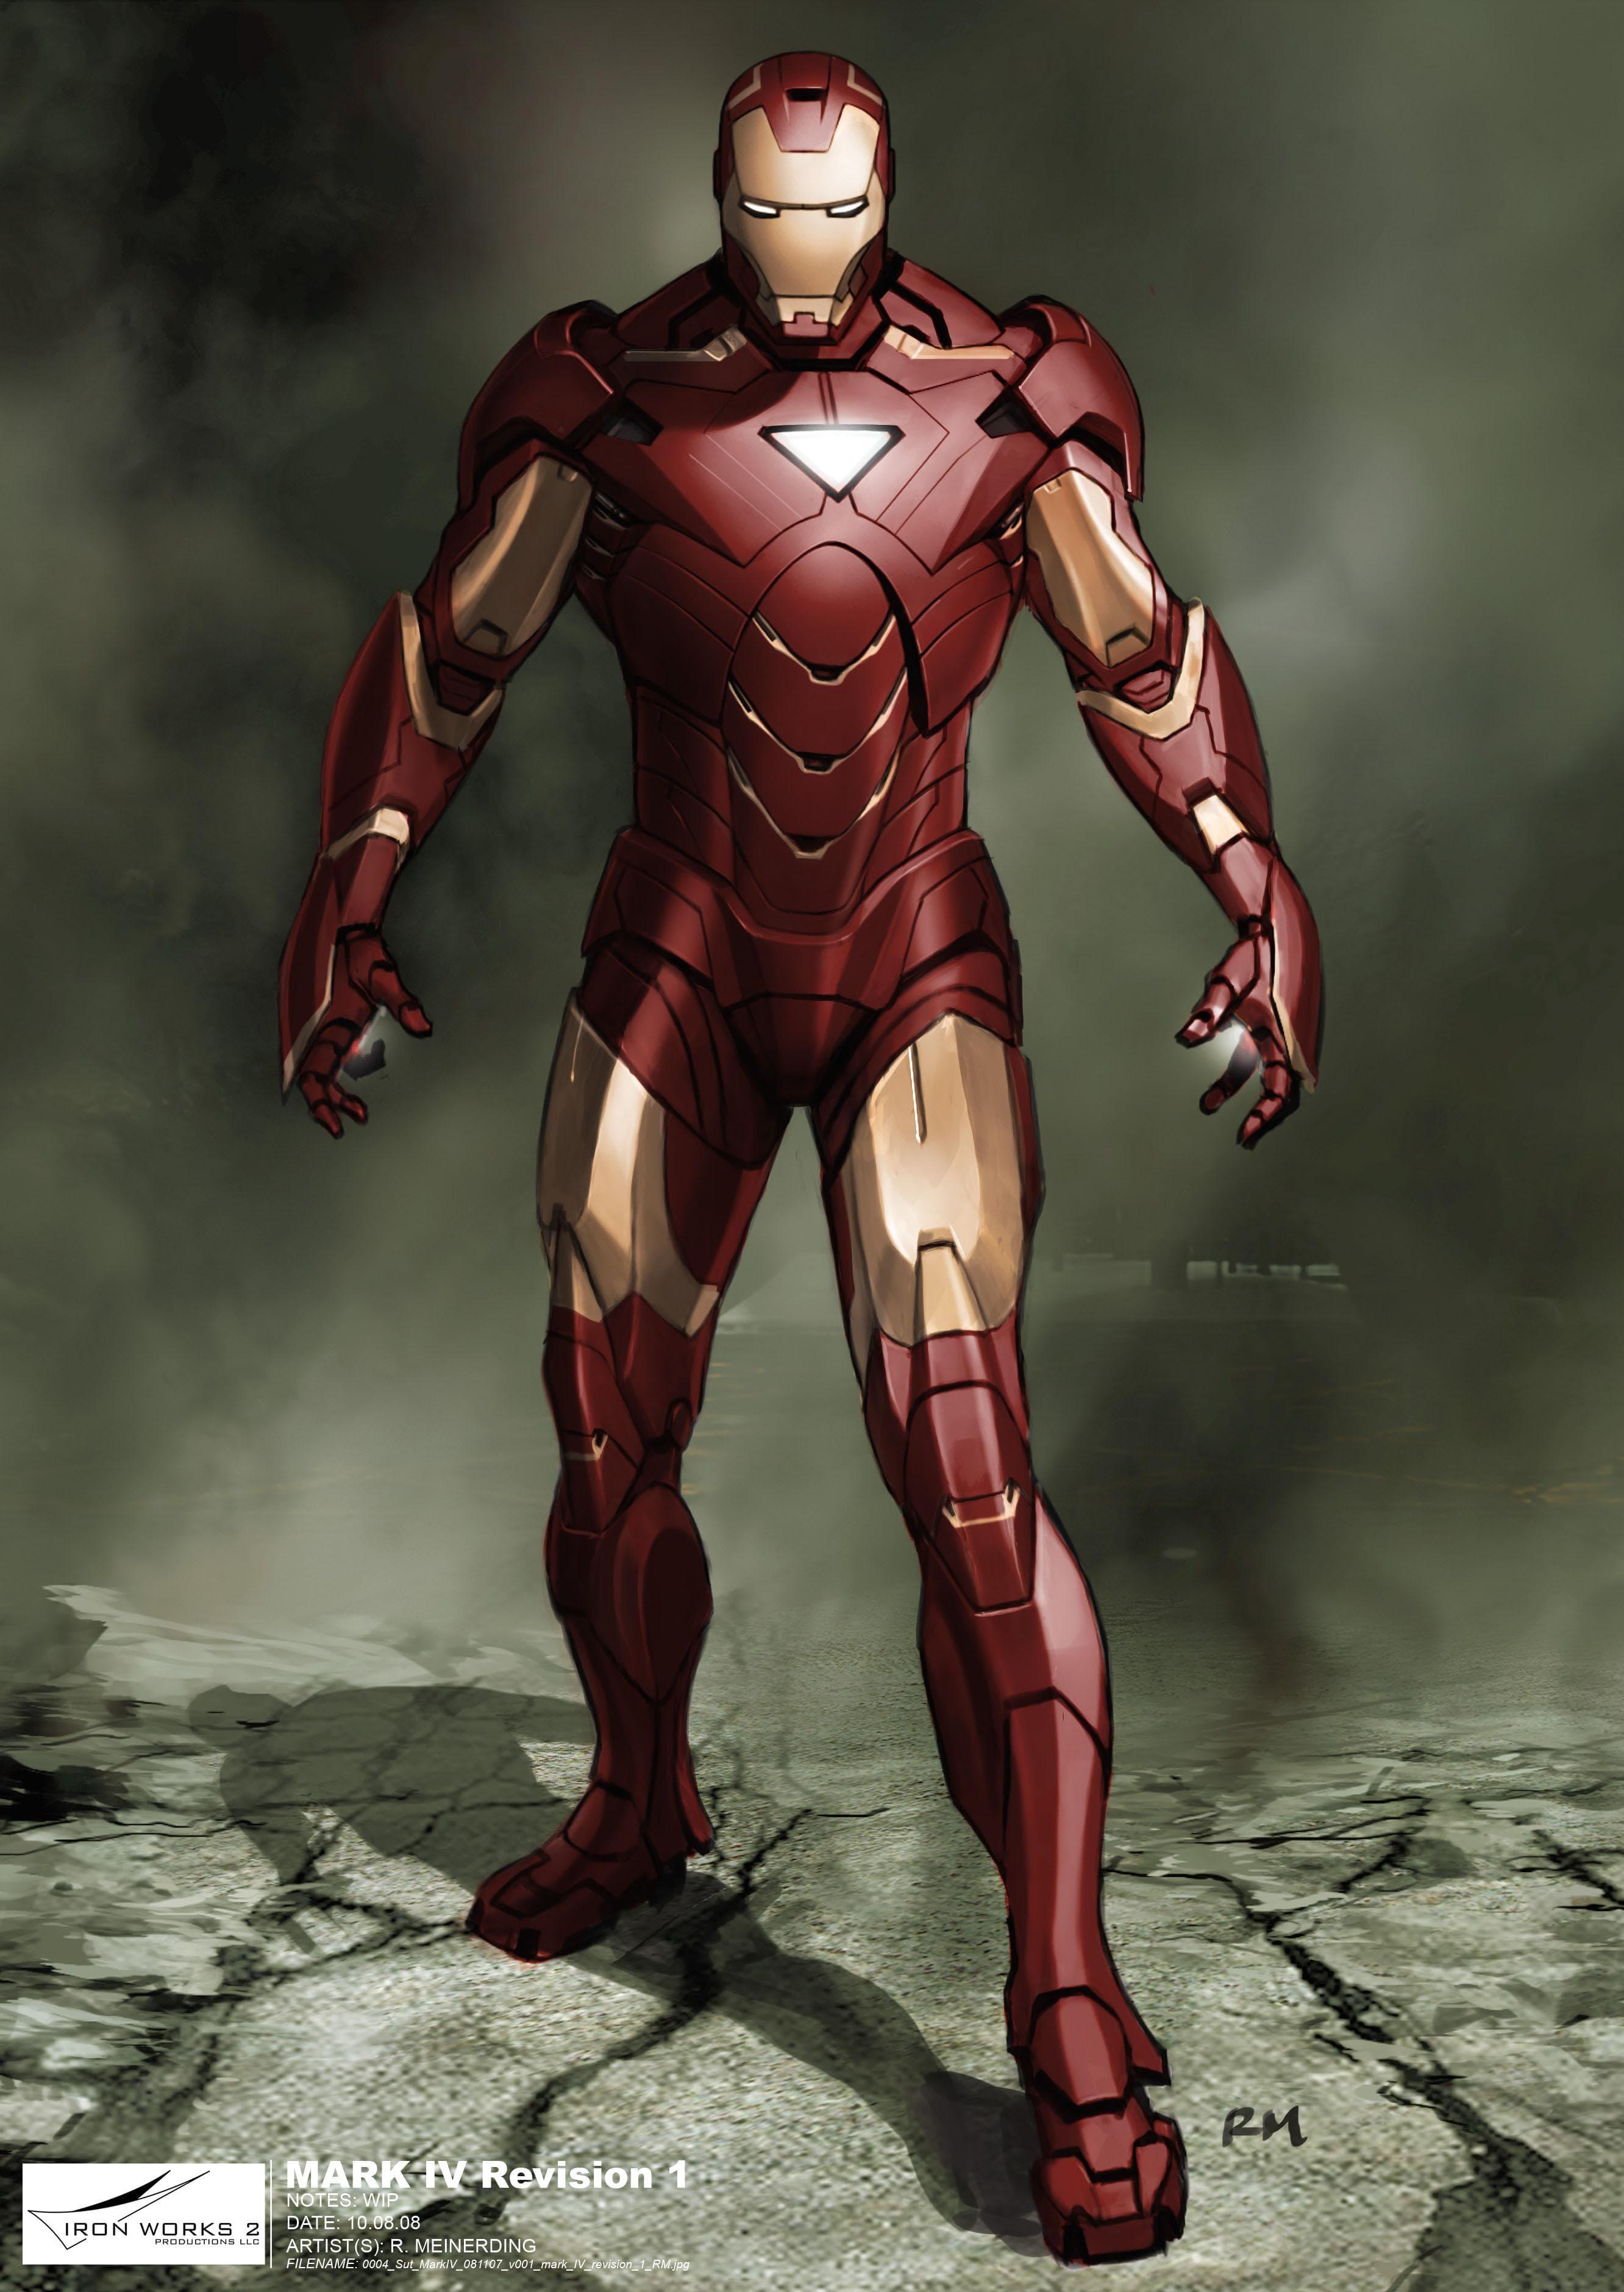 MK VI on Random Greatest Iron Man Armor